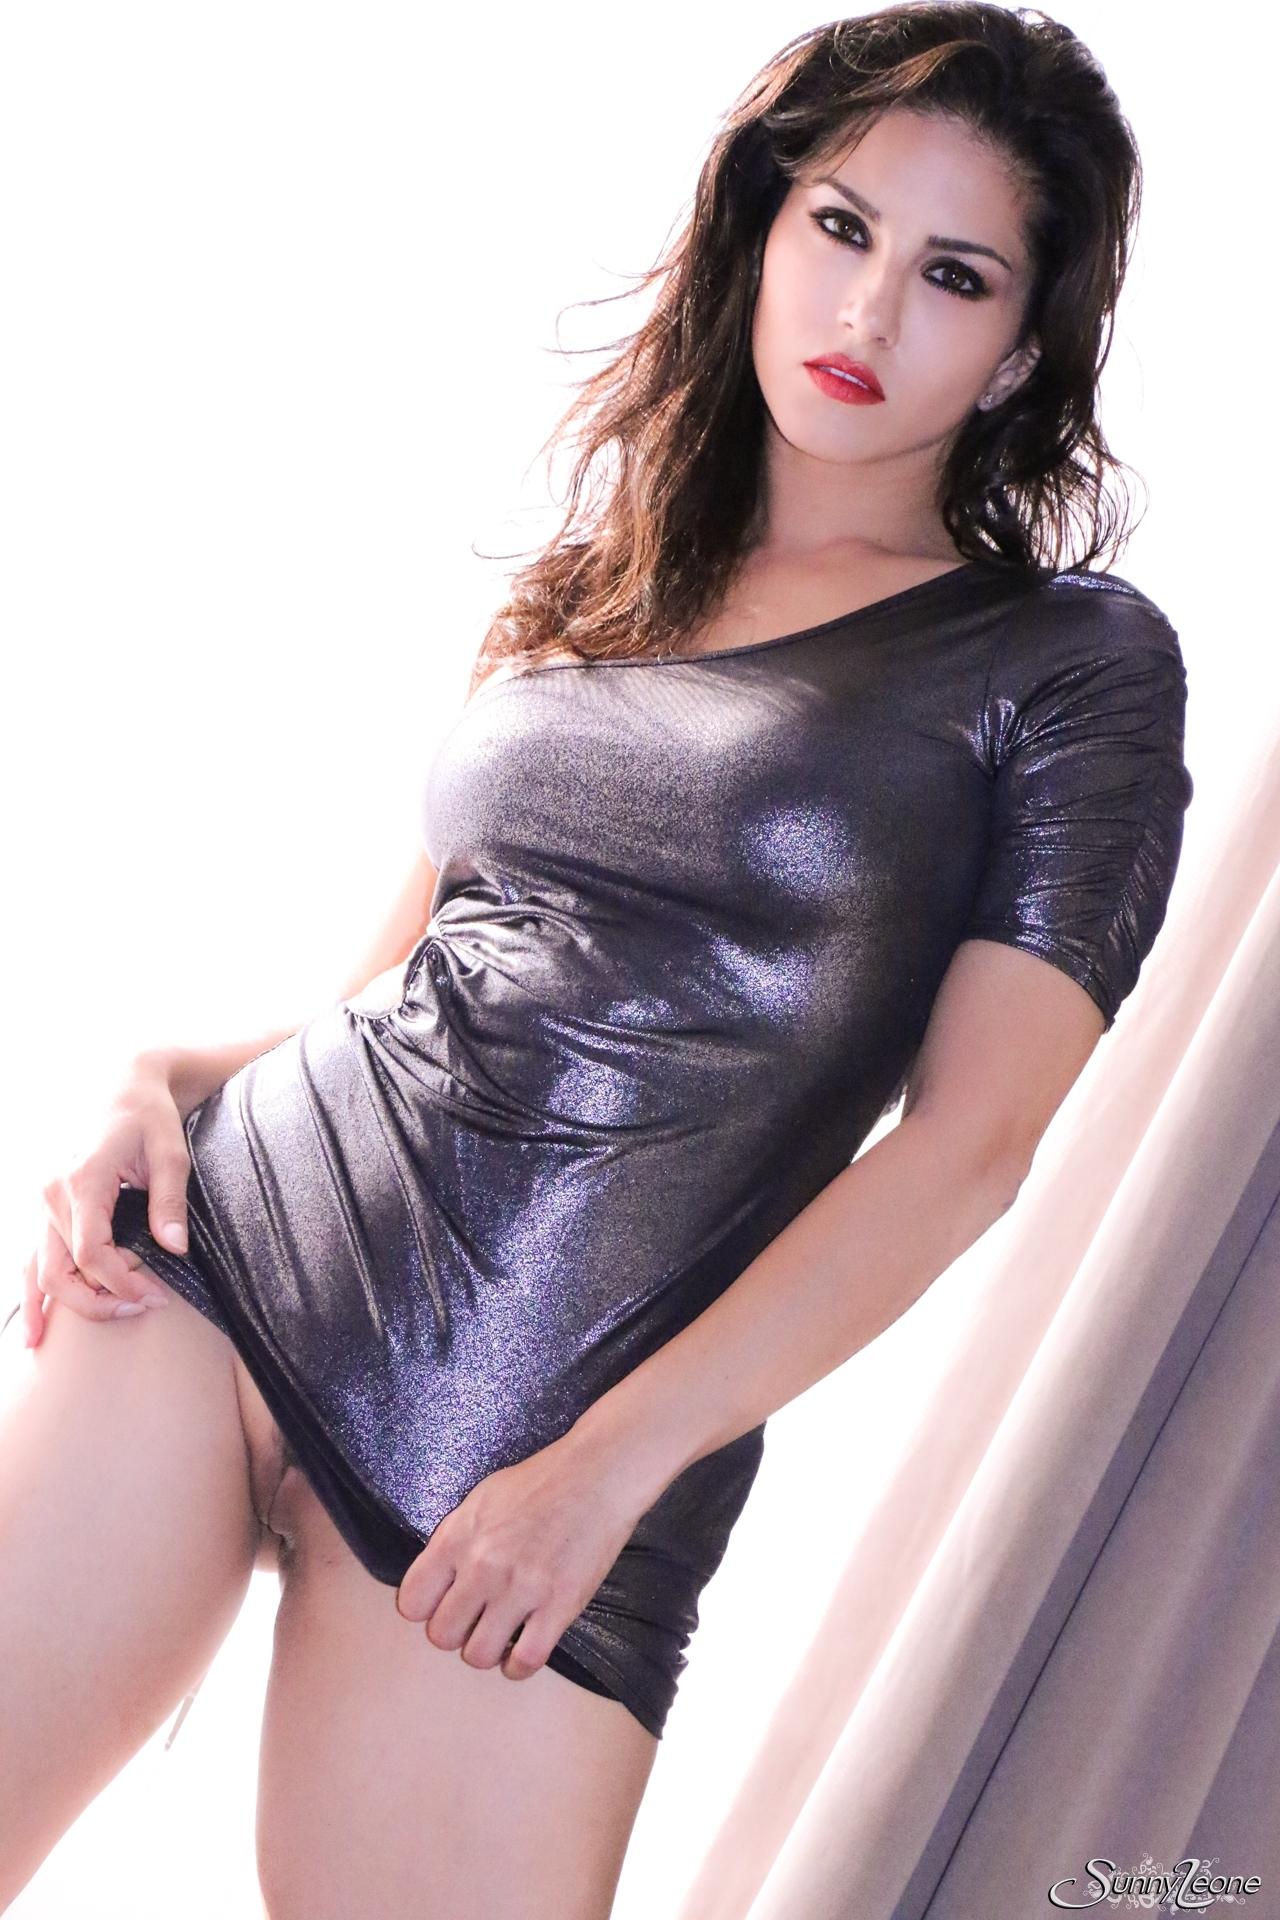 blazingmovies pic teasers 51891 df88a63ff3 nude 01 51891 03